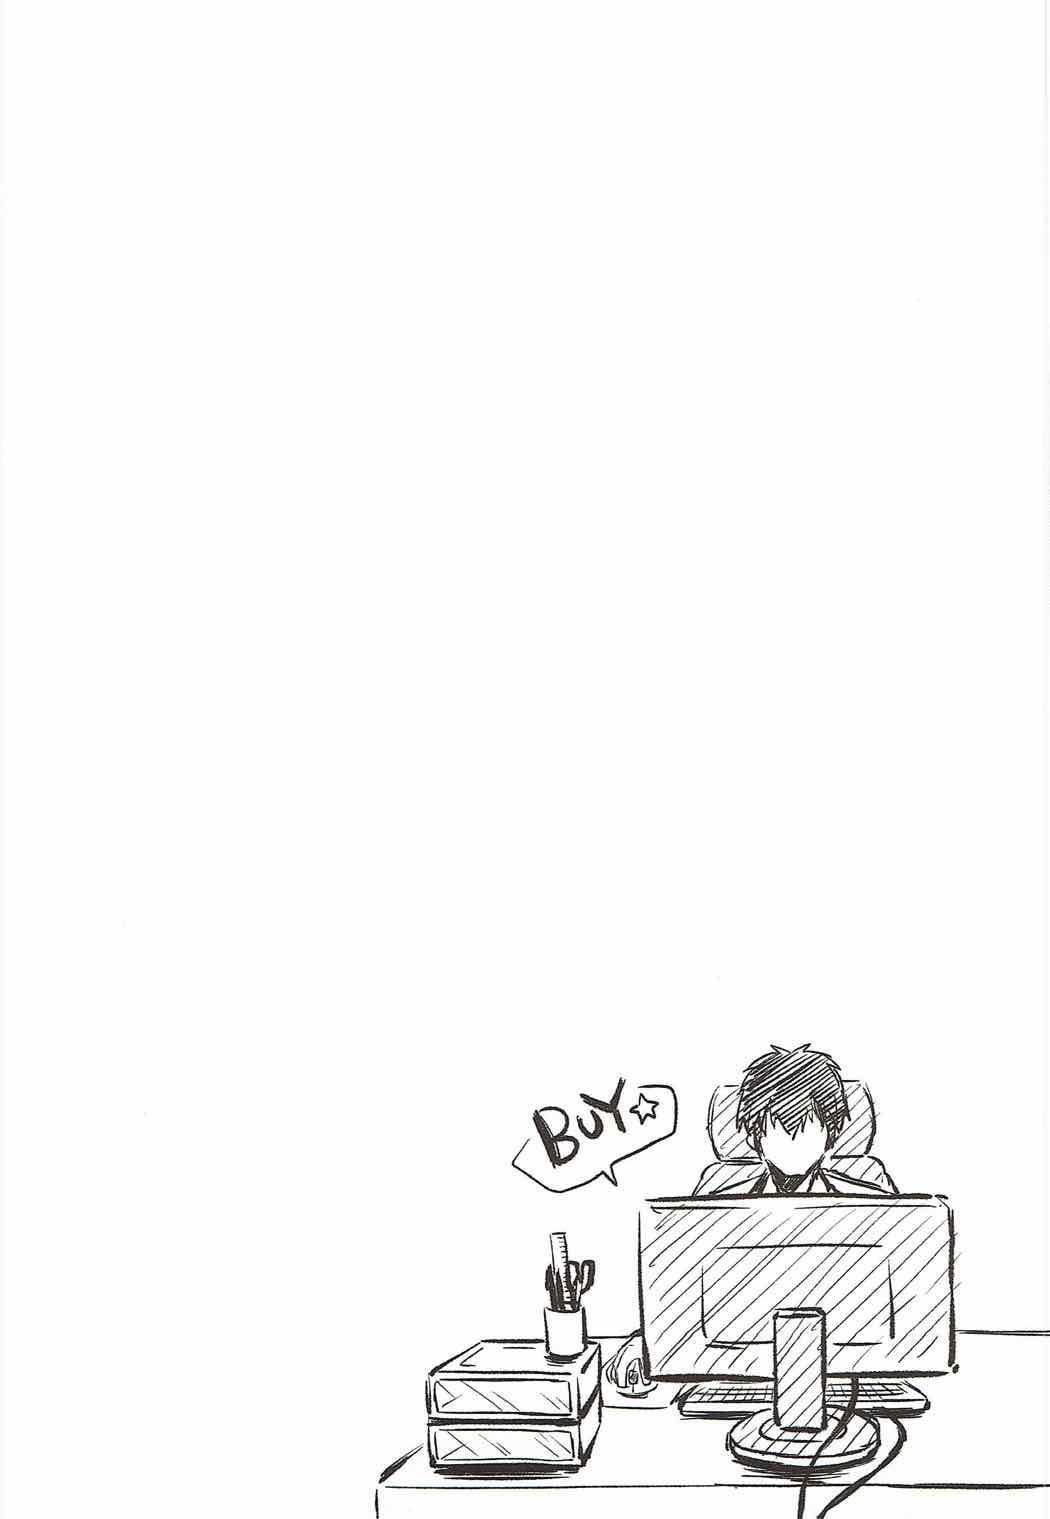 Syuko to Nurunuru Ichaicha Massage 2